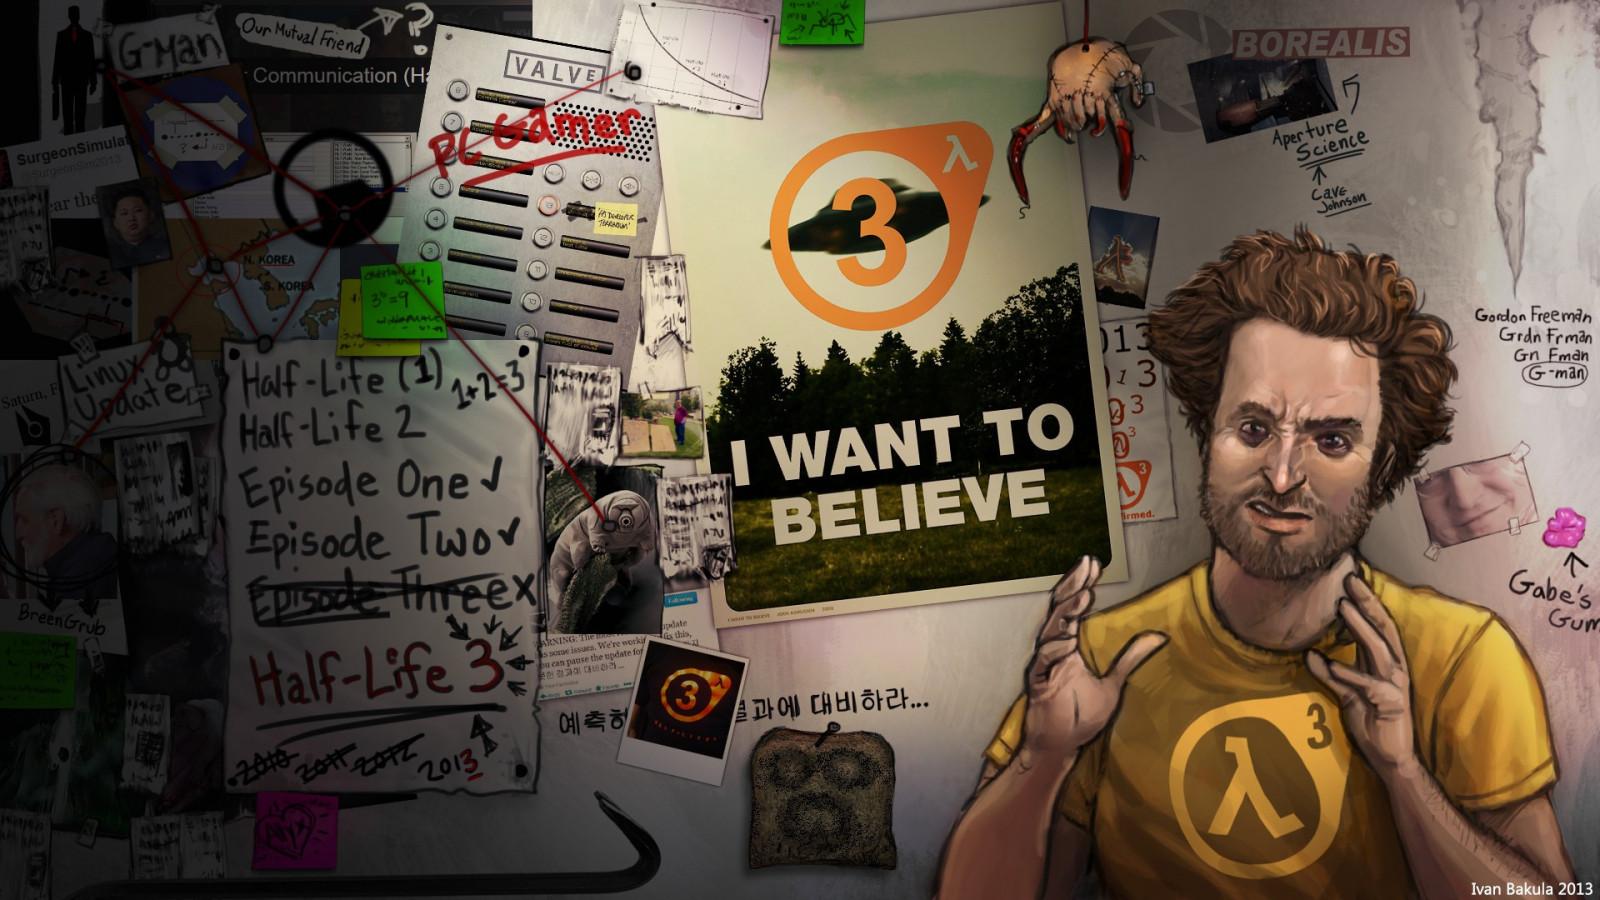 video games memes Steam software Portal game Half Life comics poster Half Life 2 G Man Half Life 3 Alyx Vance Valve Corporation Tardigrade toasts crowbar Giorgio A Tsoukalos ART